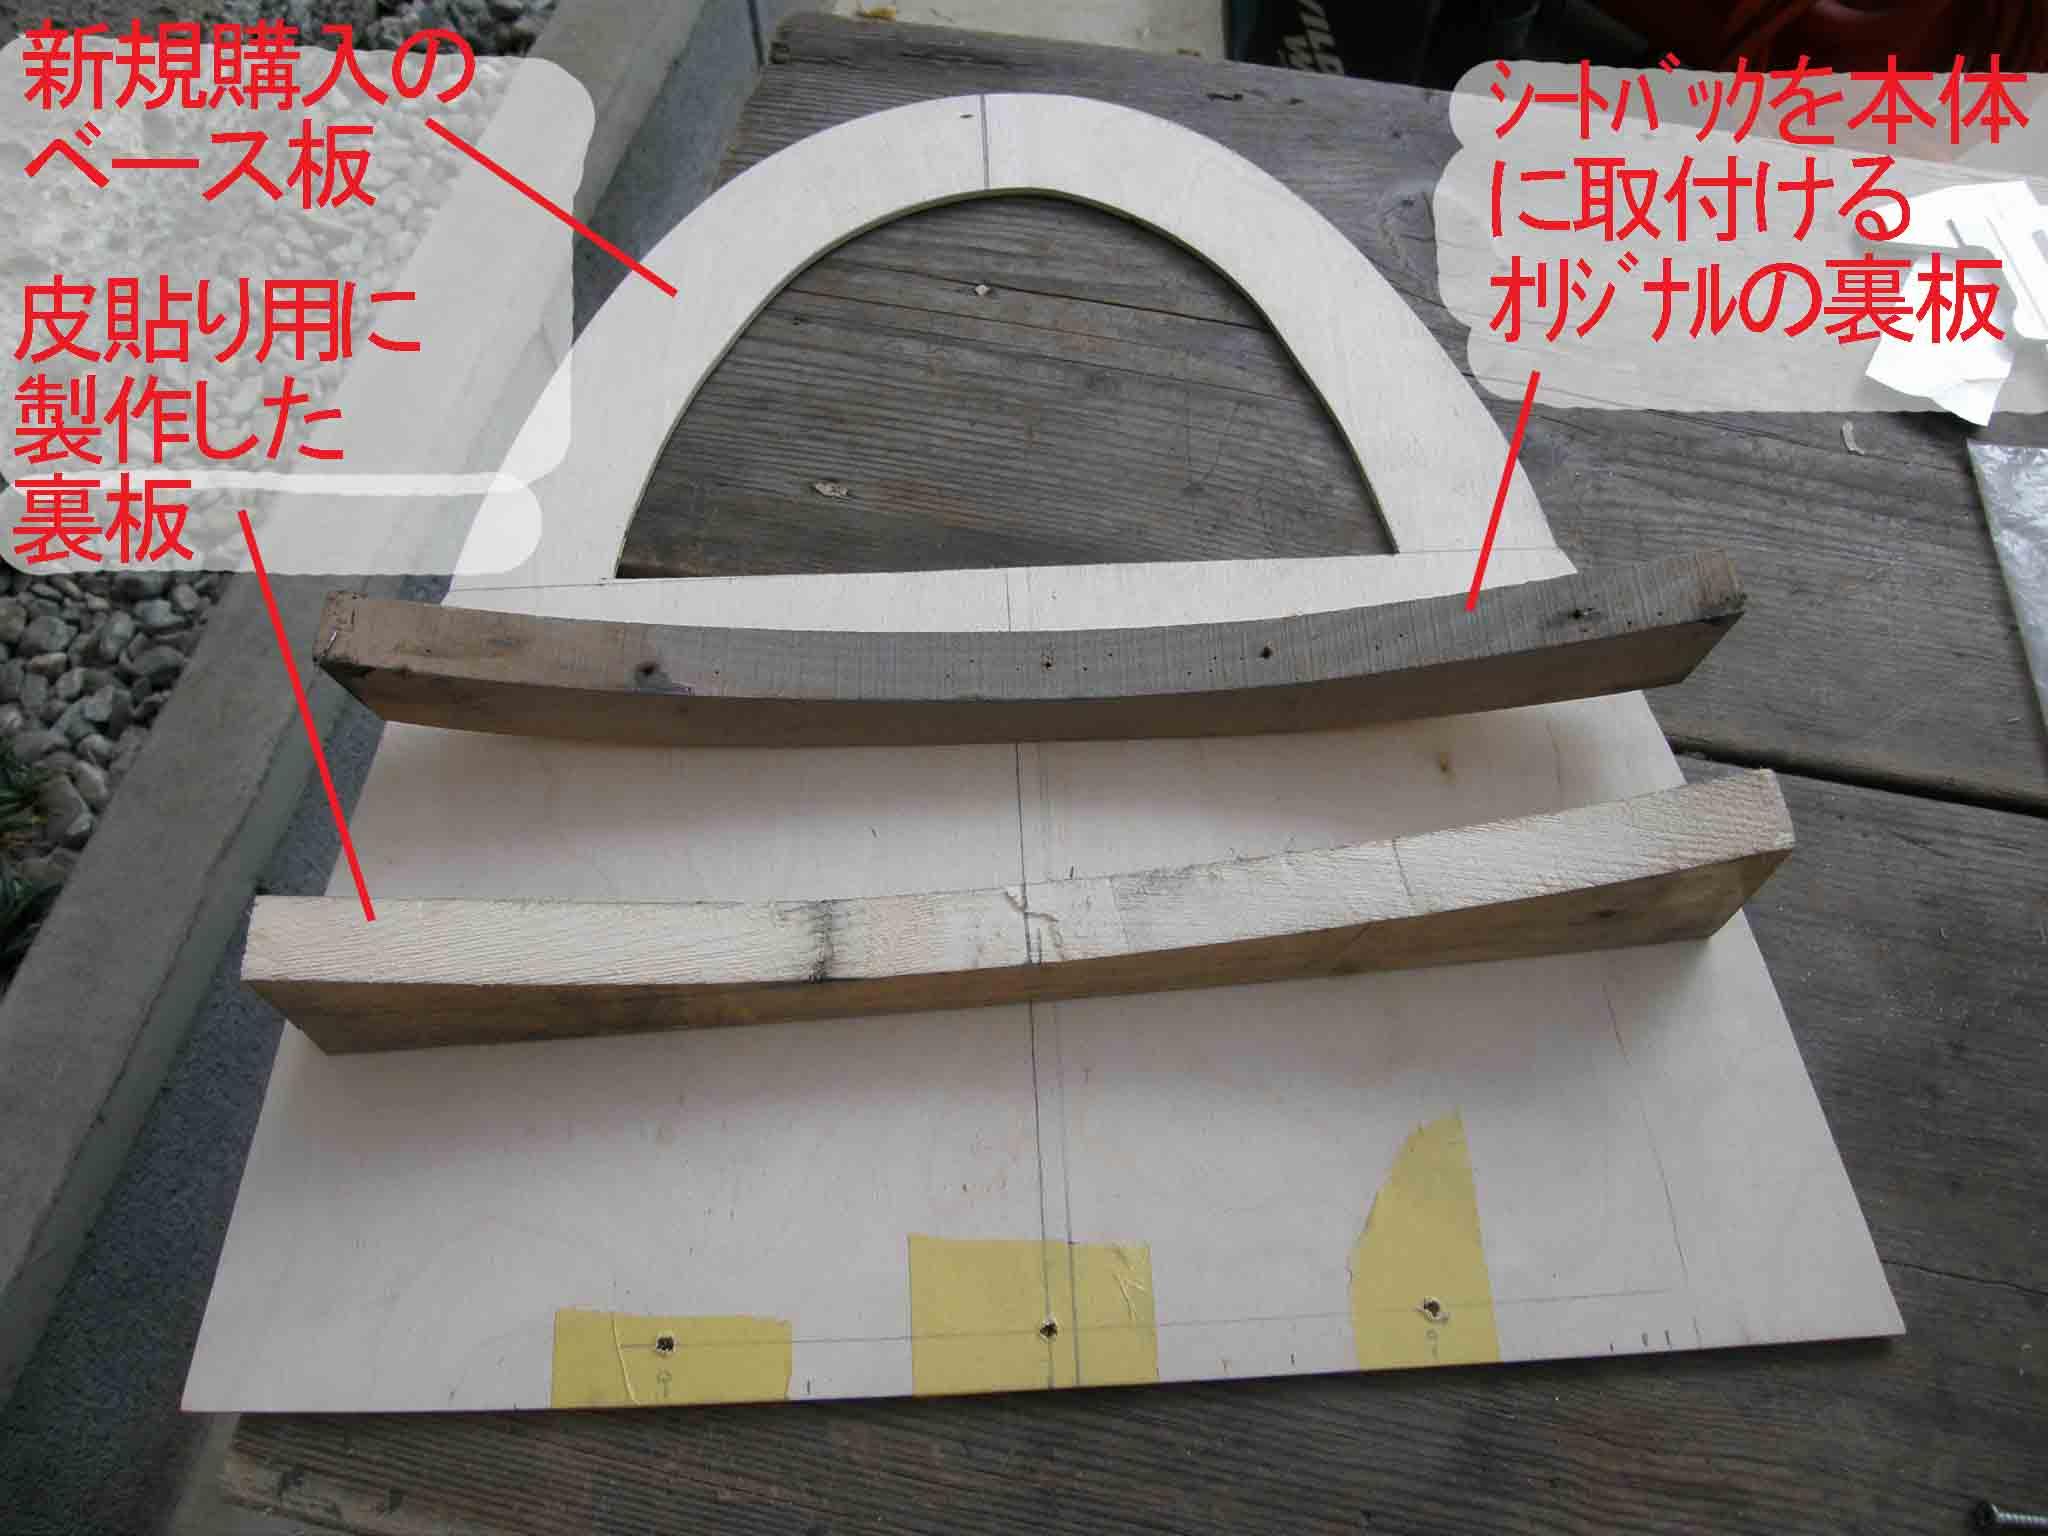 blogPC140187.jpg